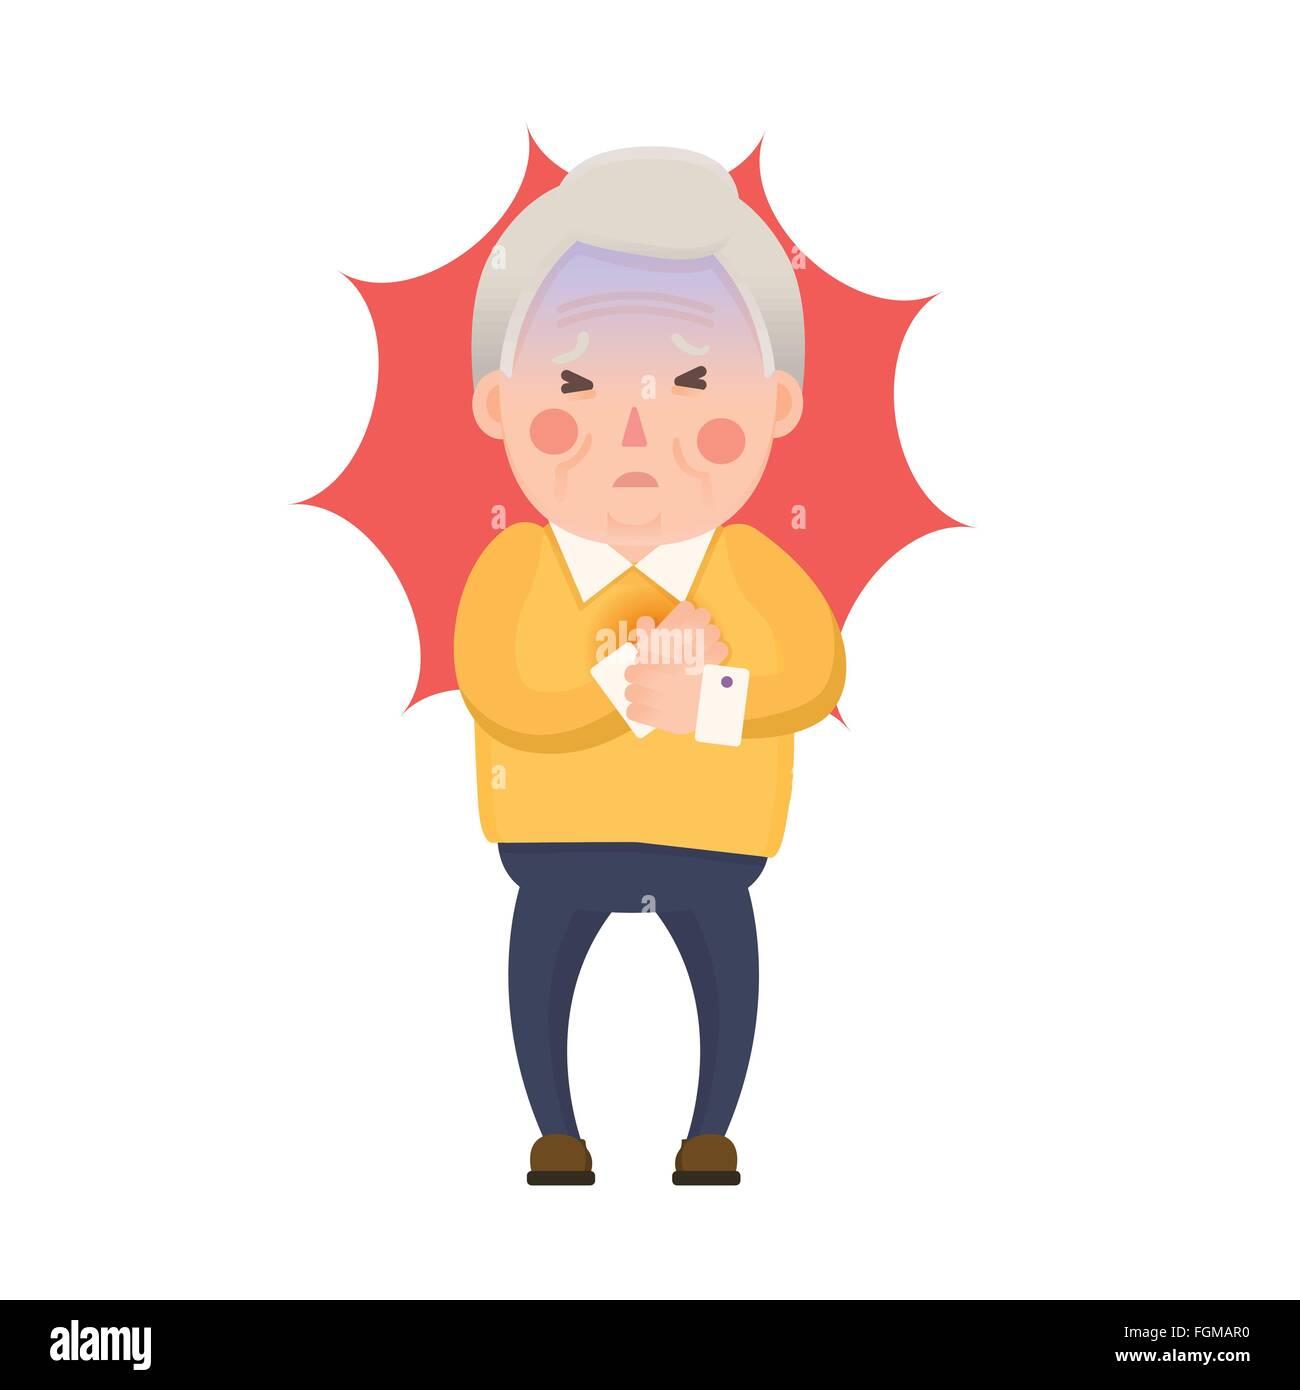 vector illustration of old man having chest pain heart